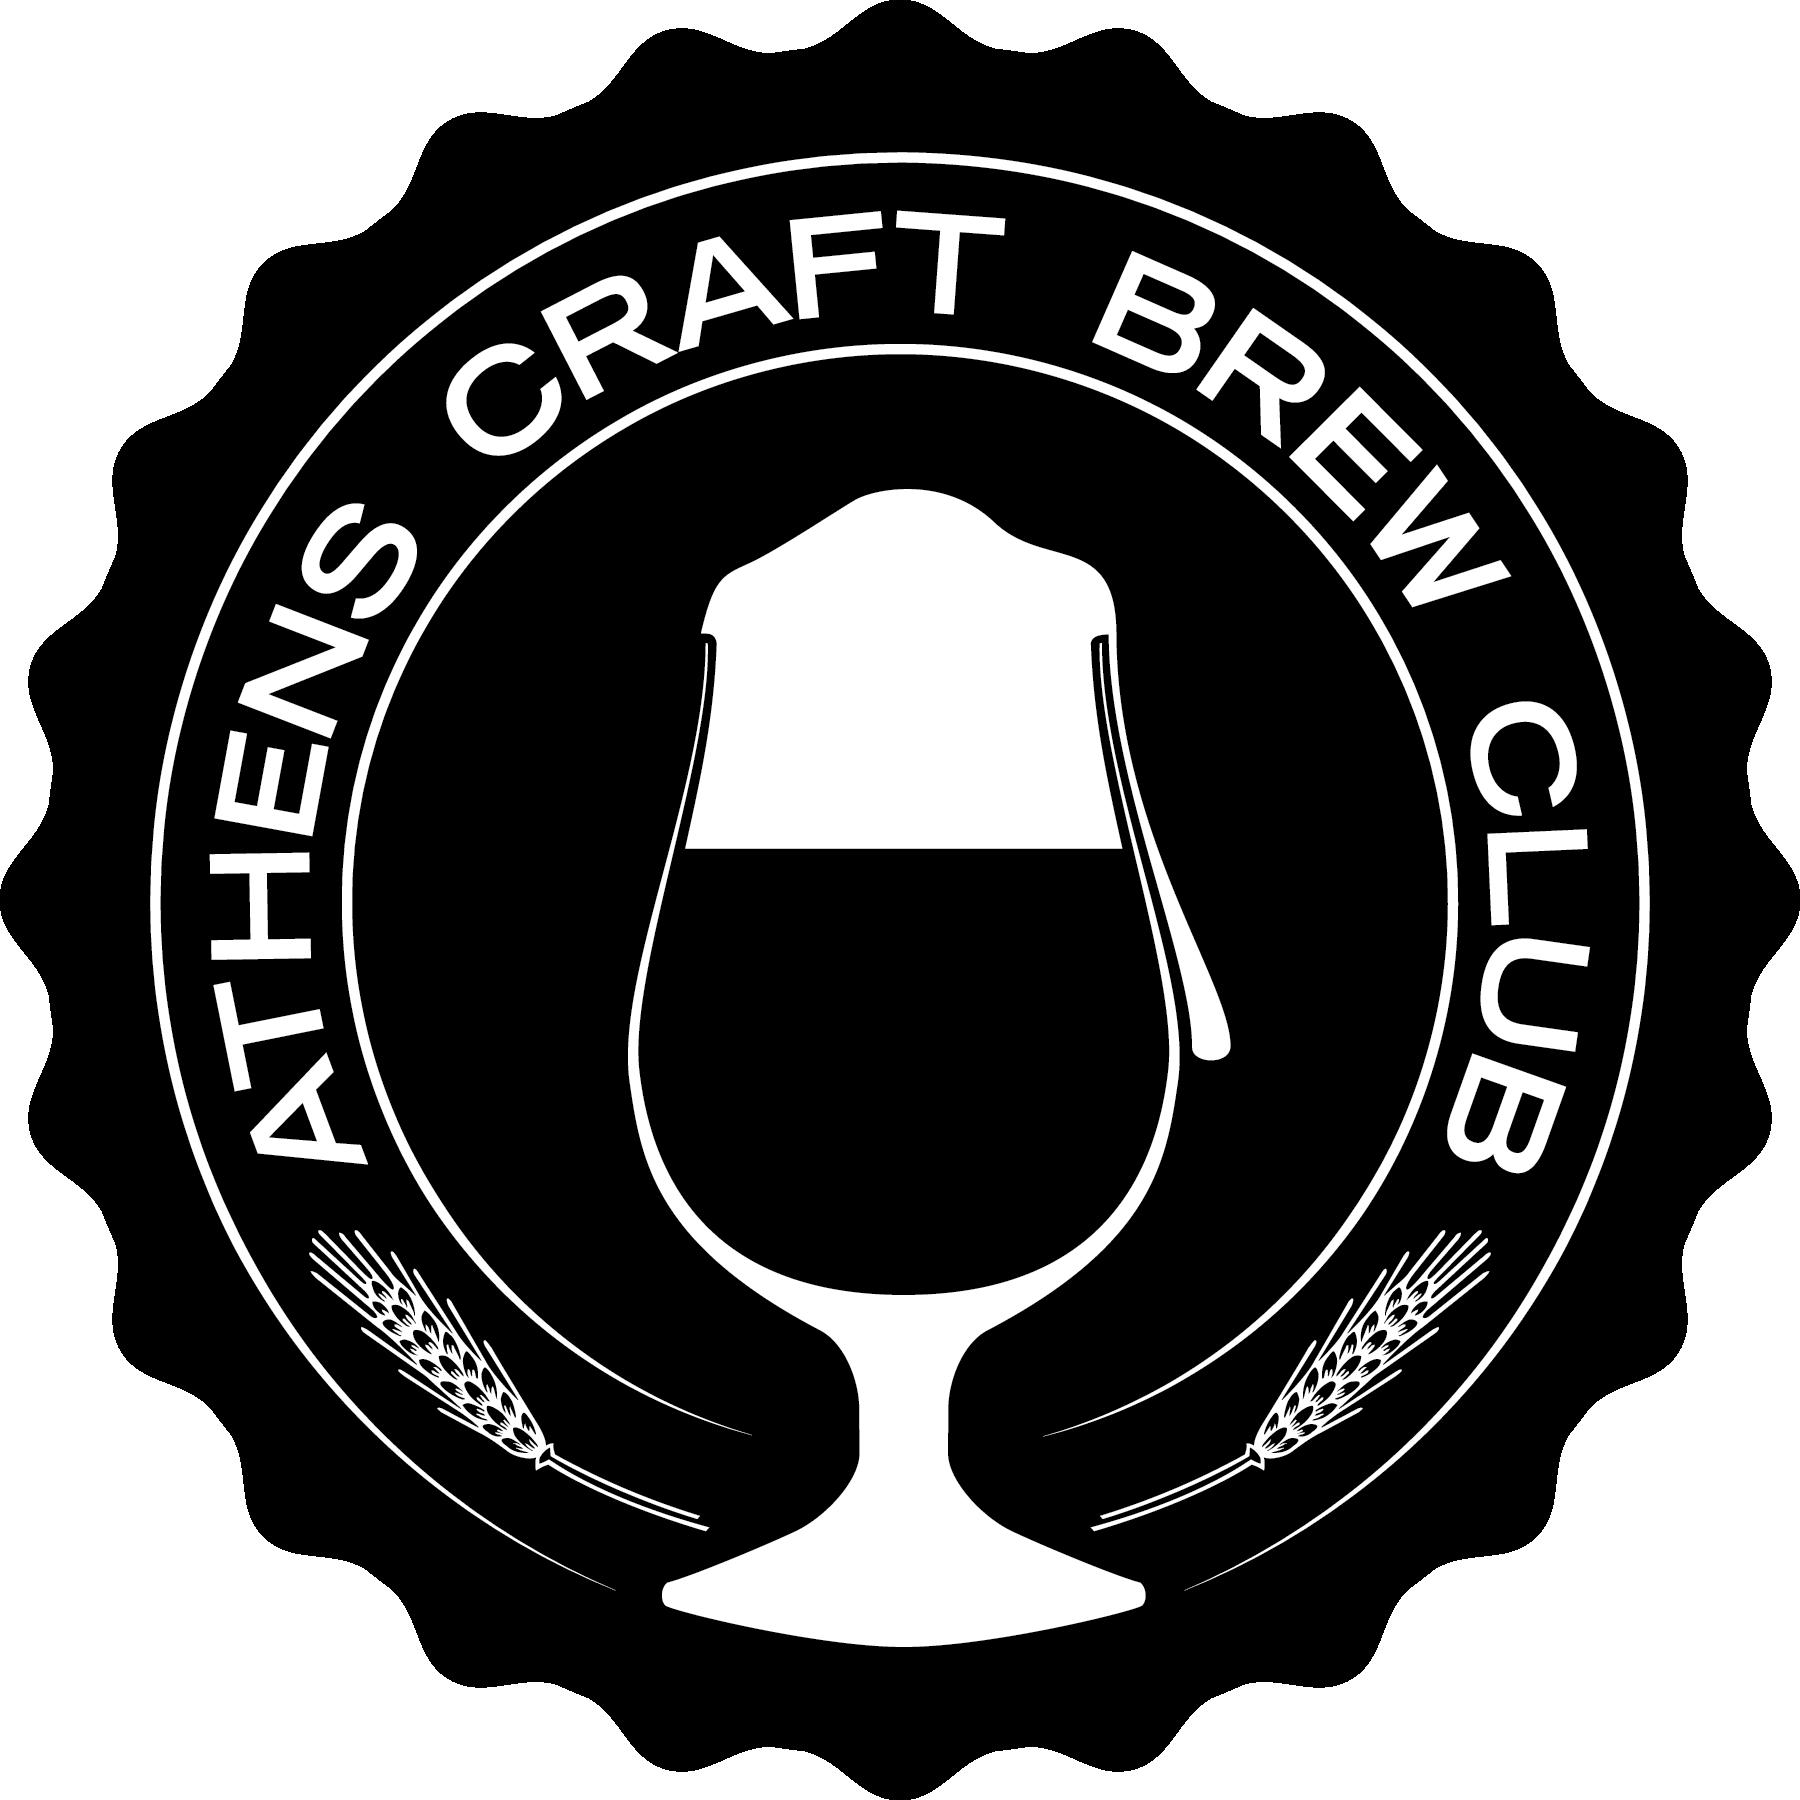 Athens Craft Brew Club